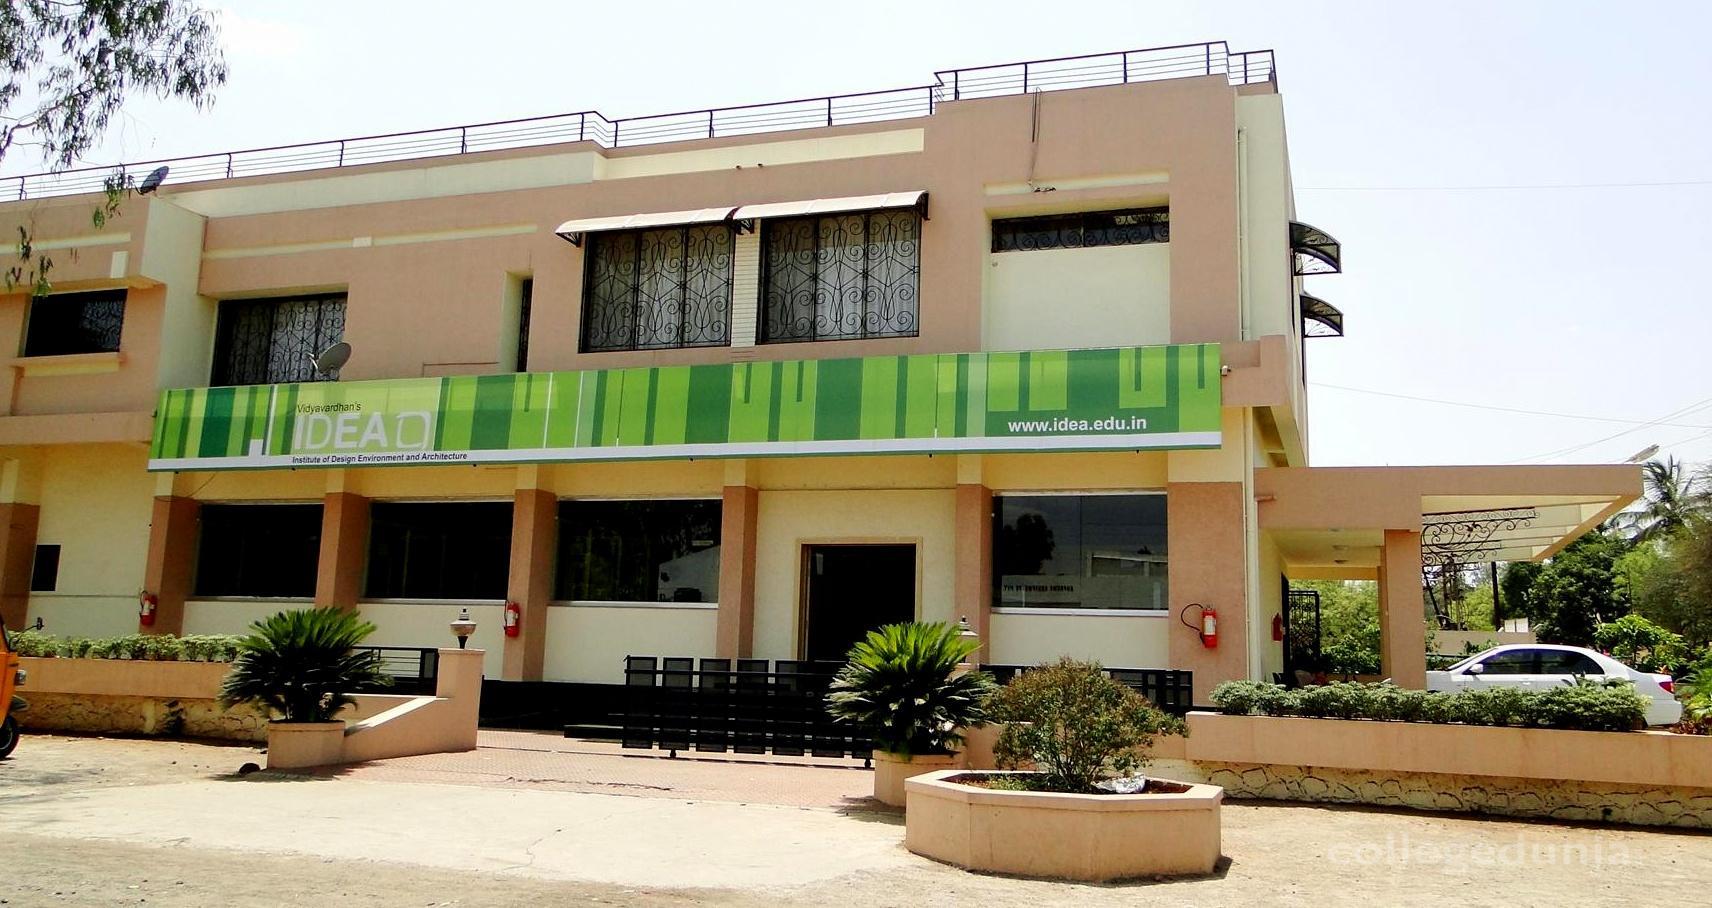 Vidyavardhan's IDEA - Institute for Design Environment and Architecture, Nashik